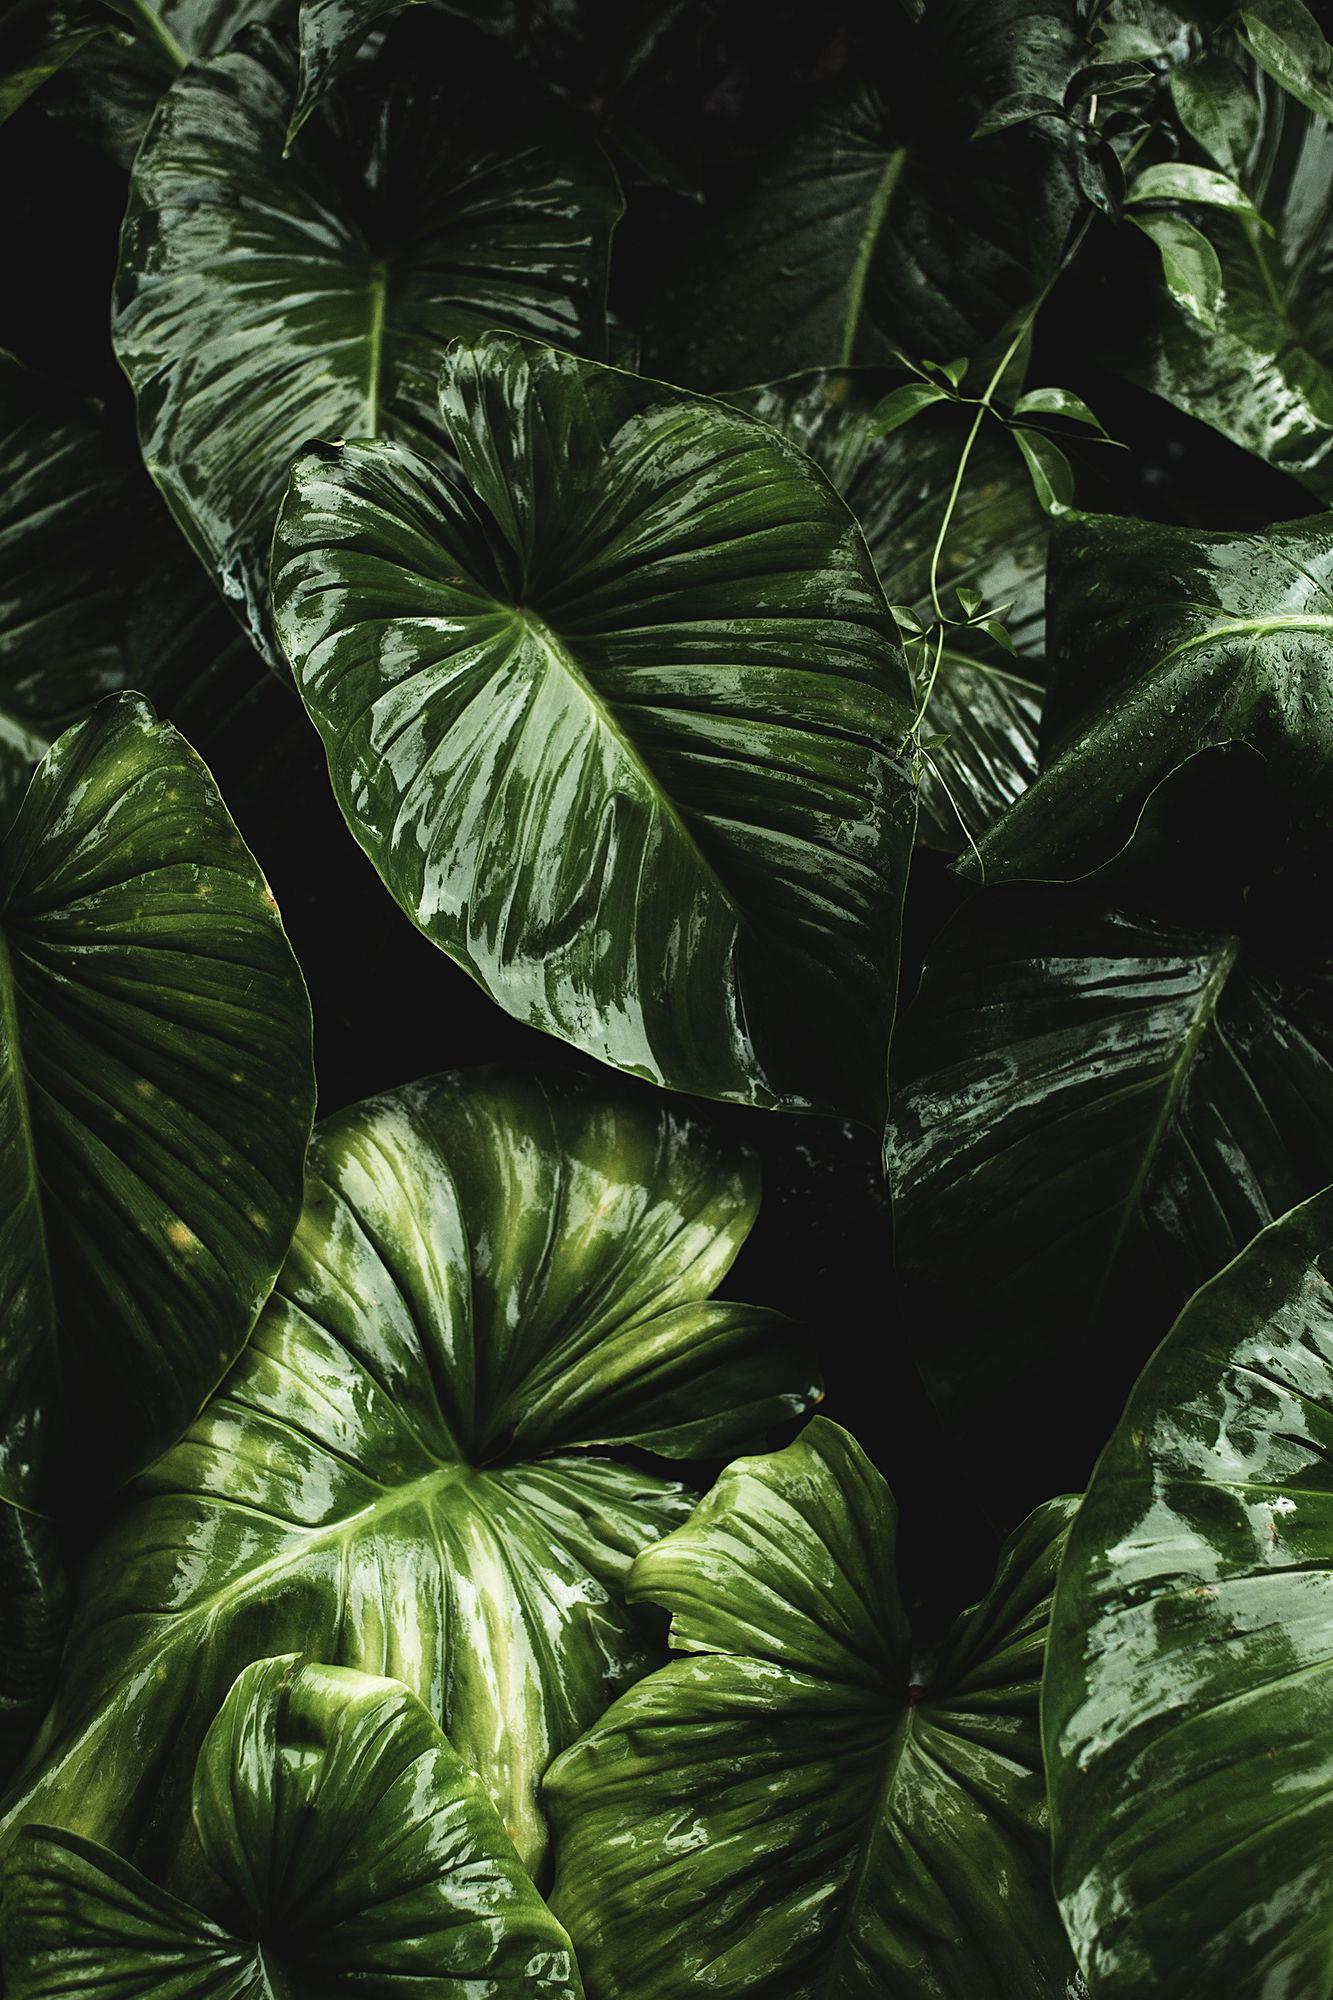 BANRAP & TOBIAS BOSCH  'PHOTO EXHIBITION' & GET TOGETHER at MARSIL - BOUTIQUE HOTEL / PHOTOKINA 2018